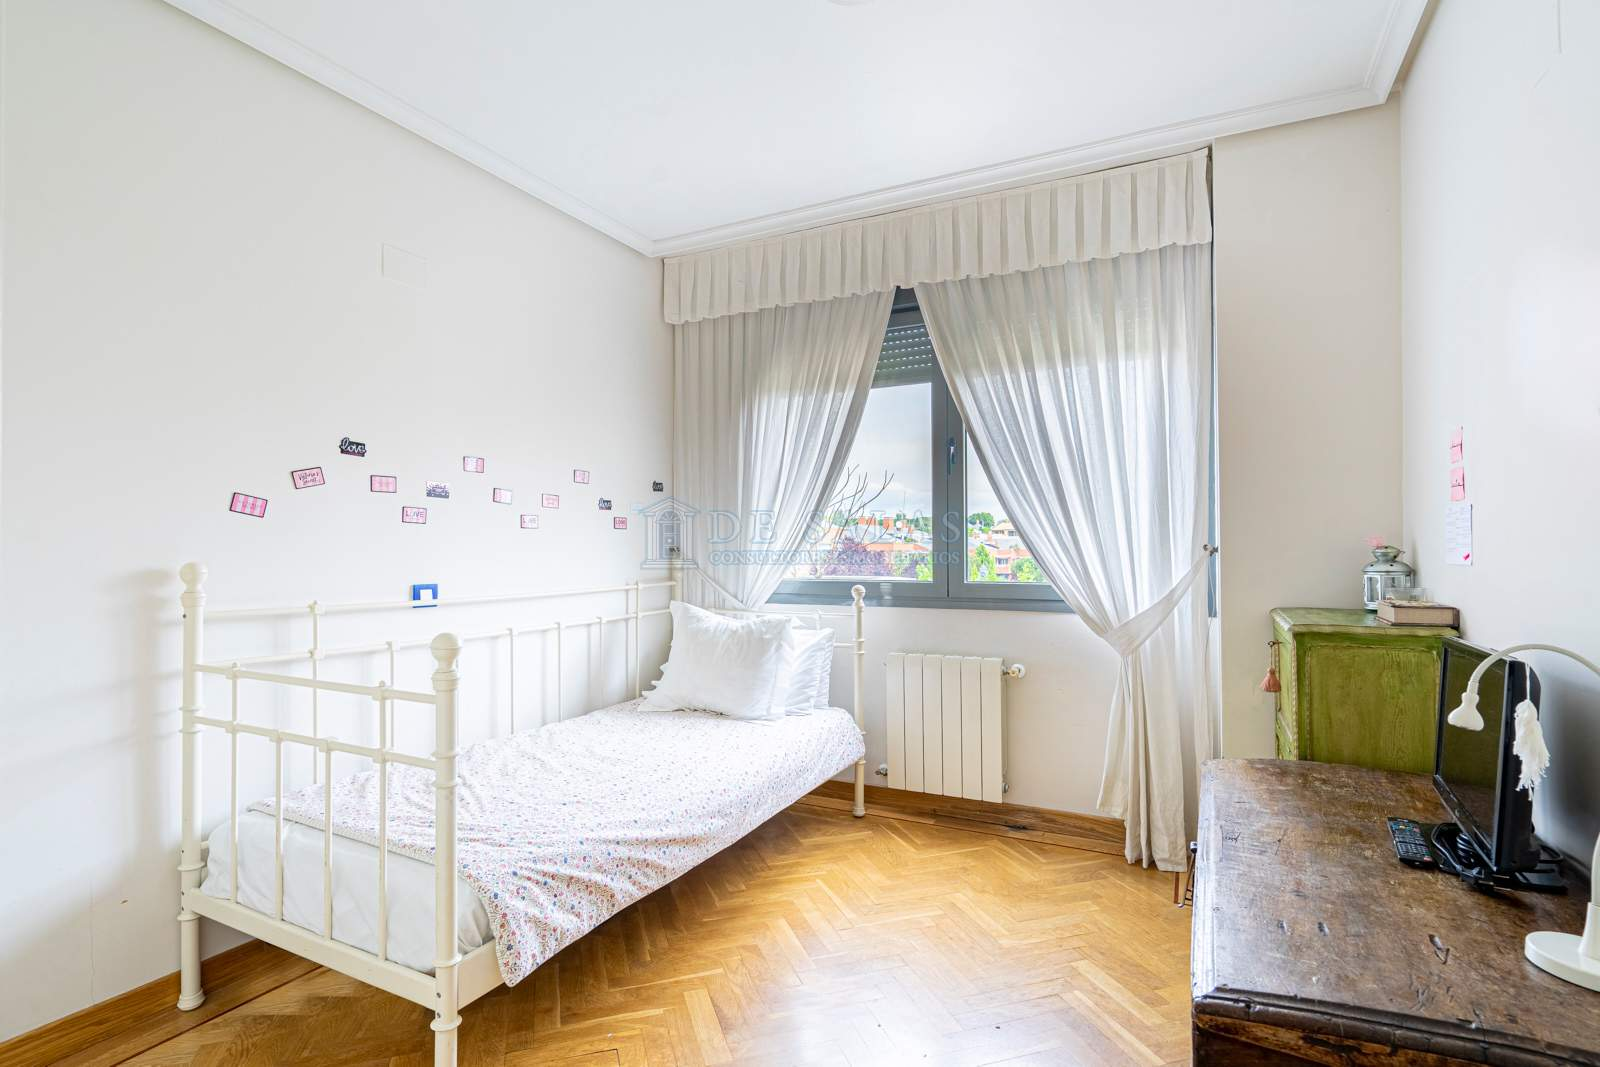 Dormitorio-0018